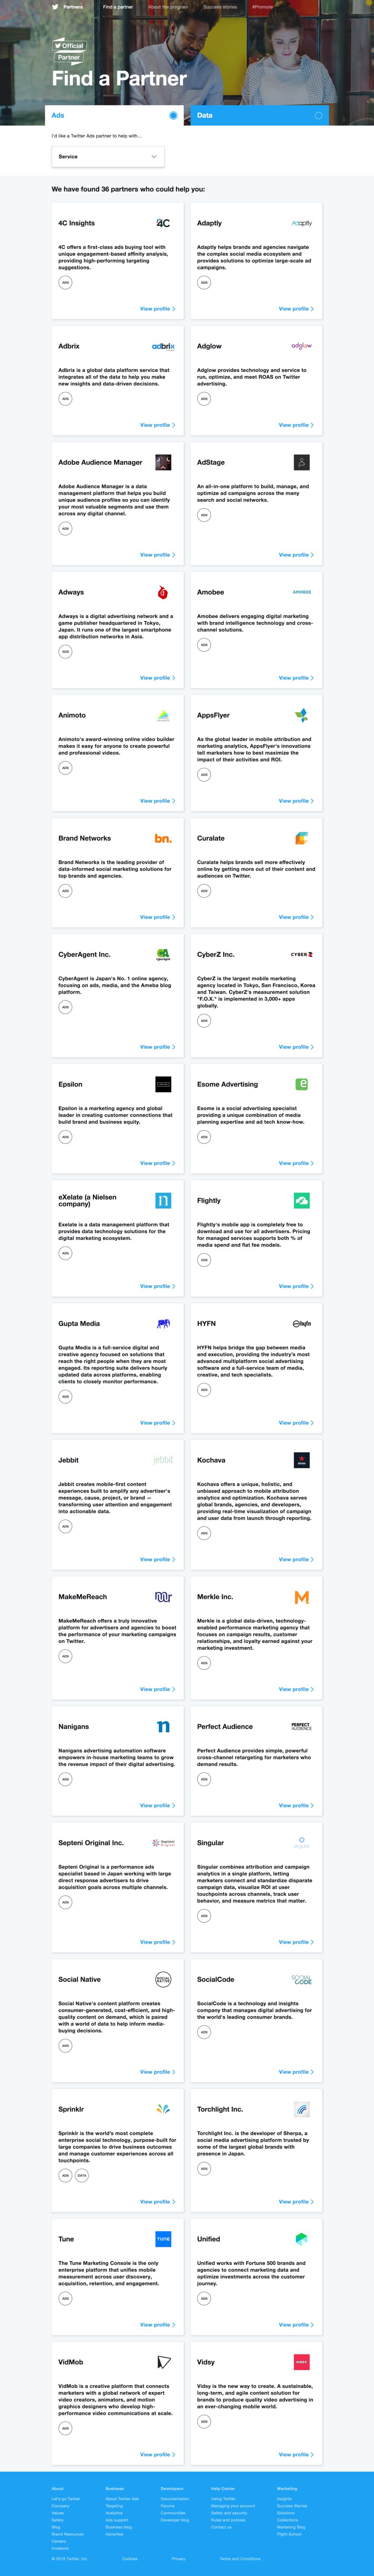 Copy of Twitter Official Partner: Find a Partner